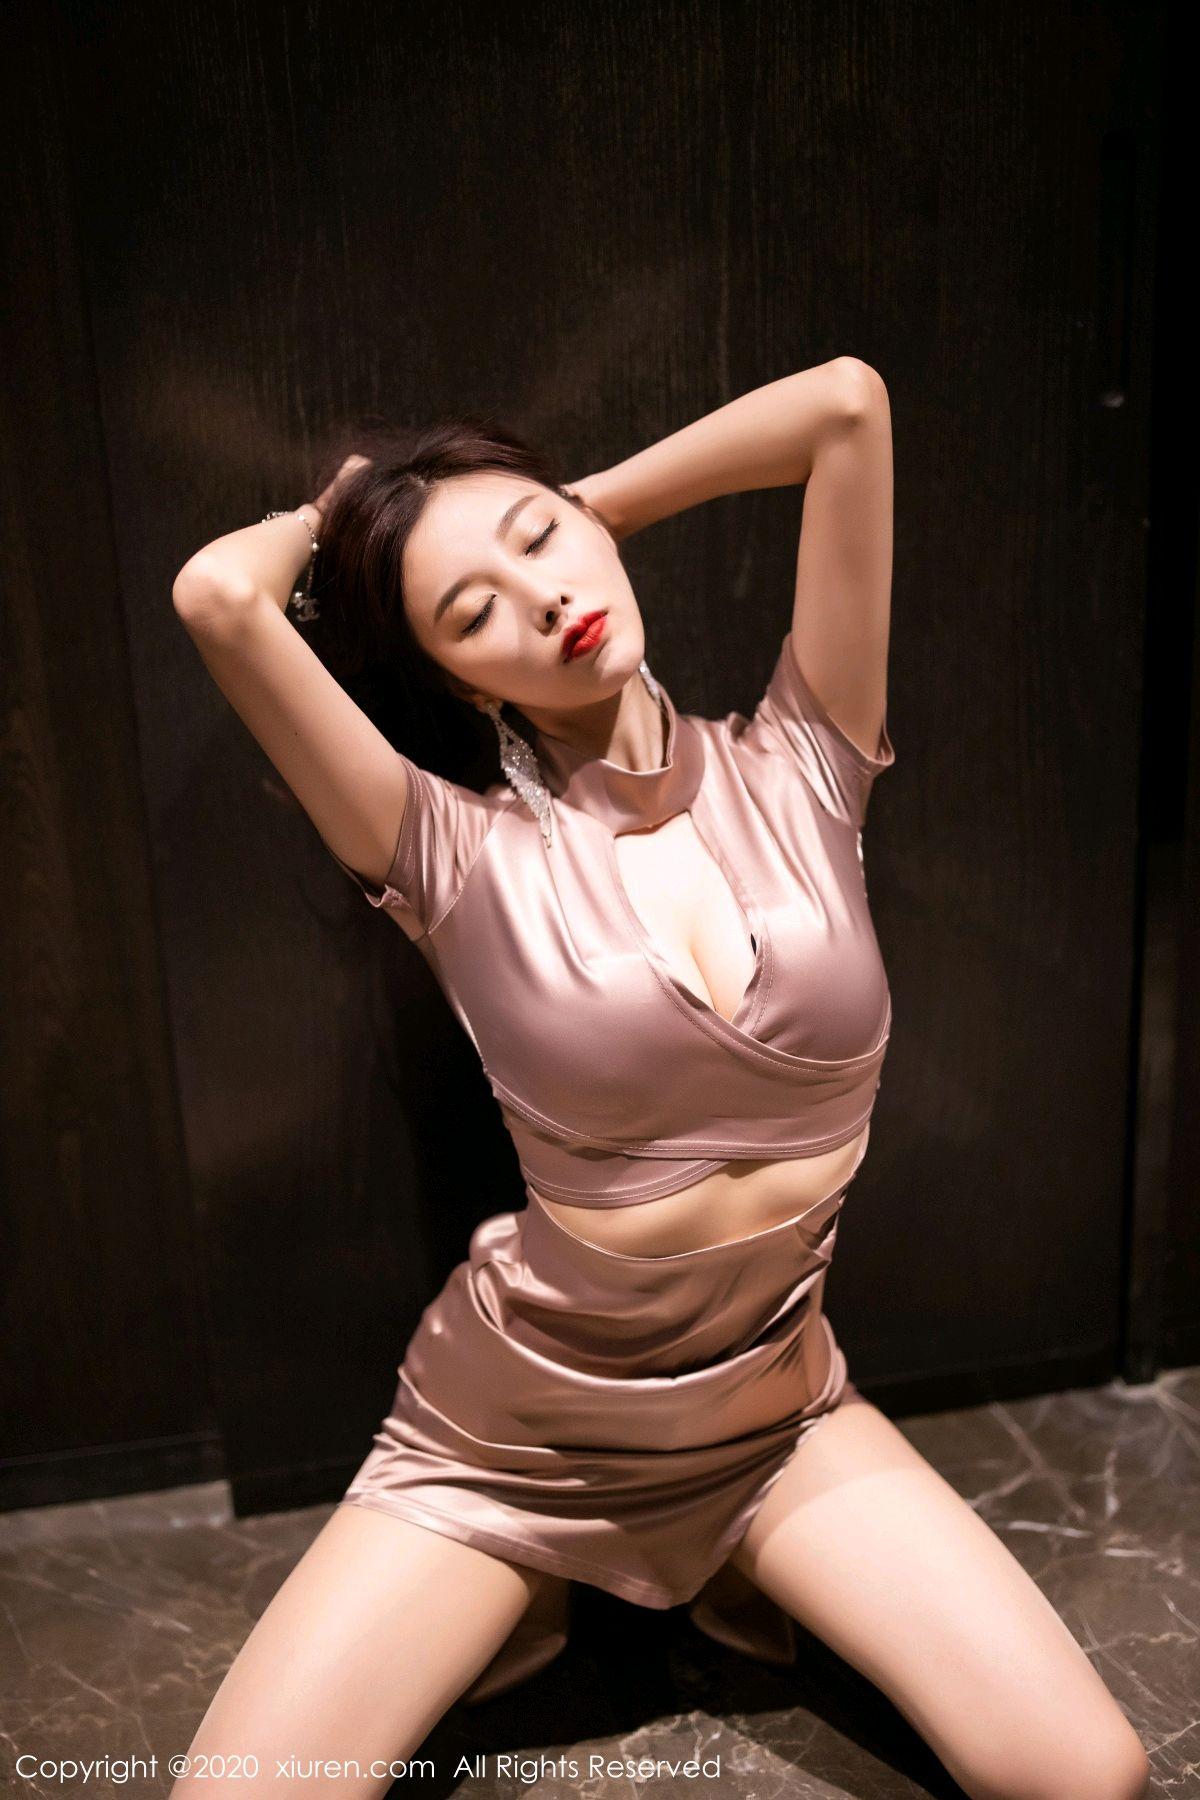 [XiuRen] Vol.2587 Yang Chen Chen 37P, Underwear, Xiuren, Yang Chen Chen